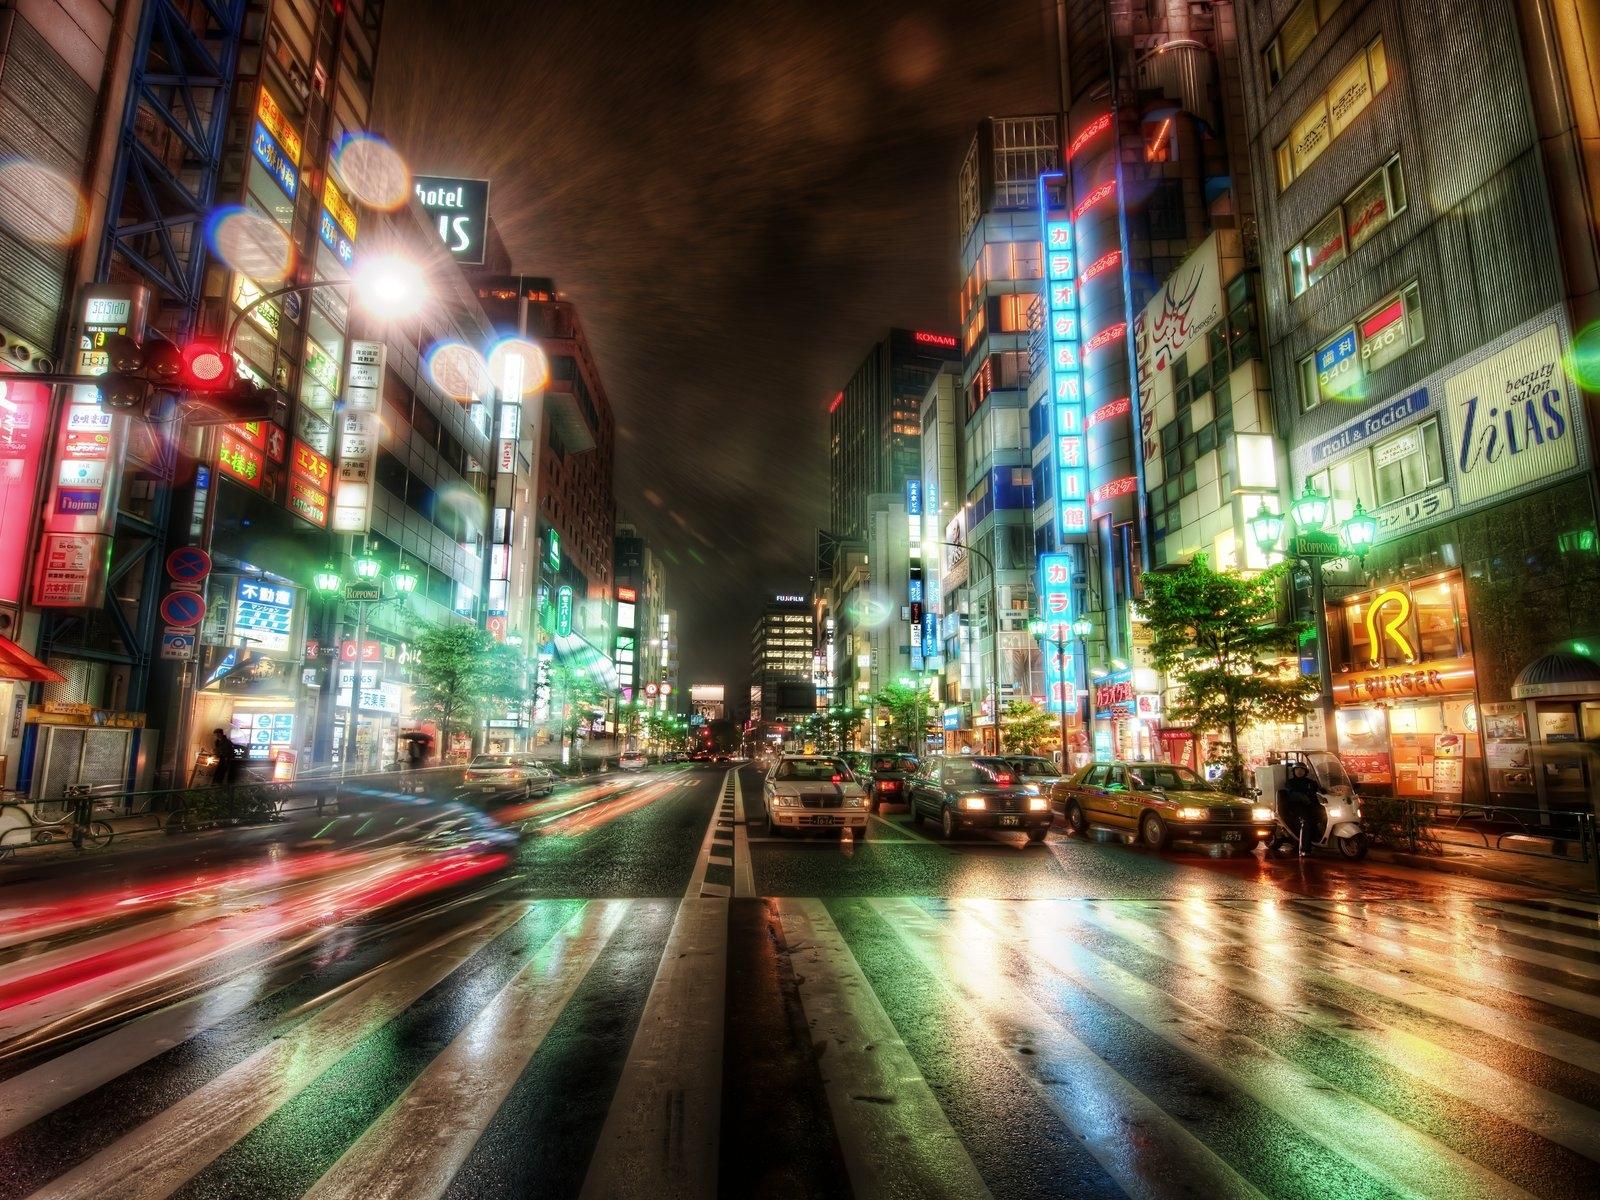 http://3.bp.blogspot.com/-F1uEaL_p03I/TrRM9DPsQiI/AAAAAAAAA24/zqEajQf4W9Y/s1600/cities_tokyo_japan_023946-1600x1200.jpg